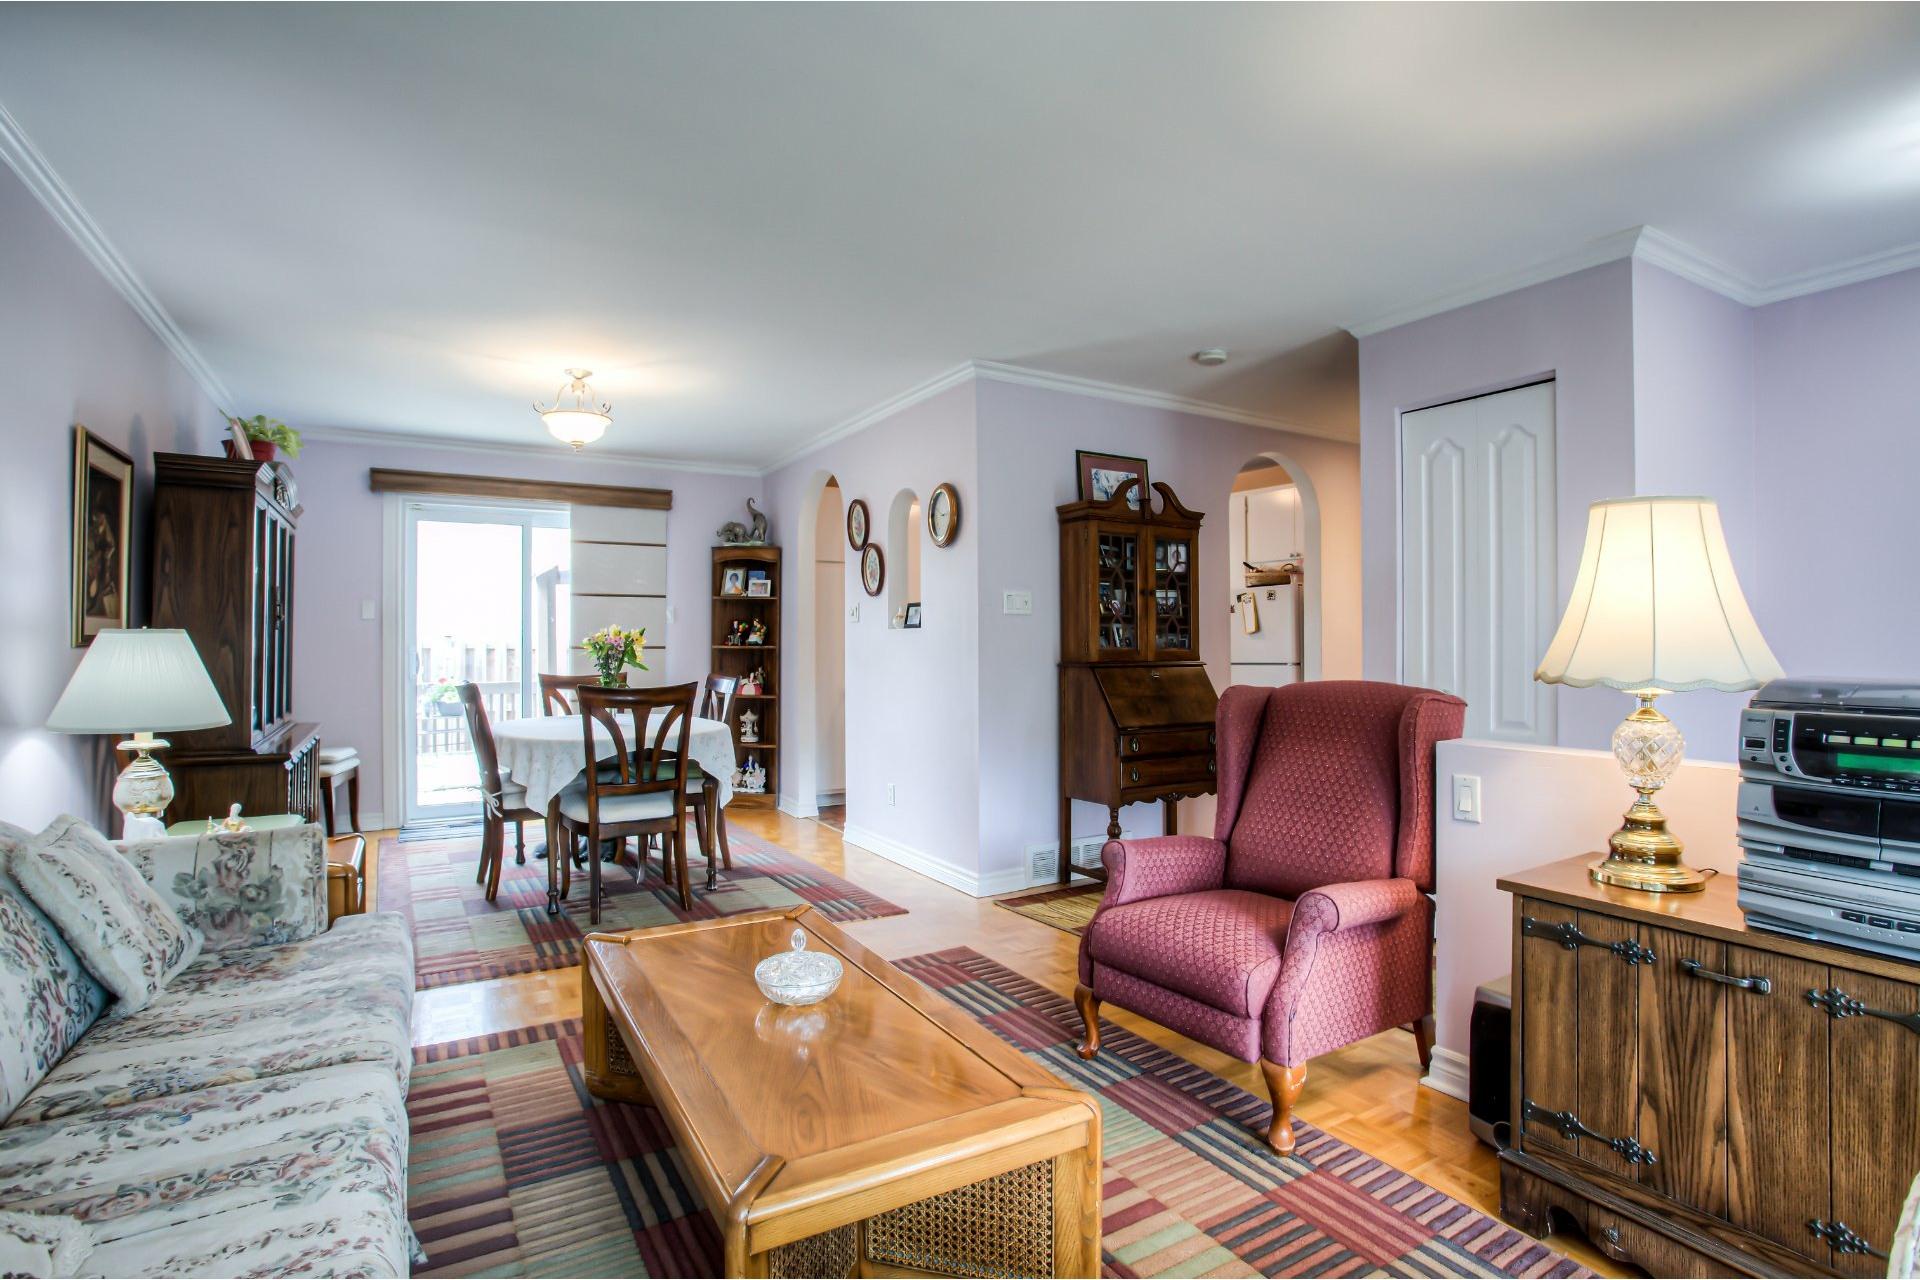 image 5 - House For sale Pierrefonds-Roxboro Montréal  - 10 rooms